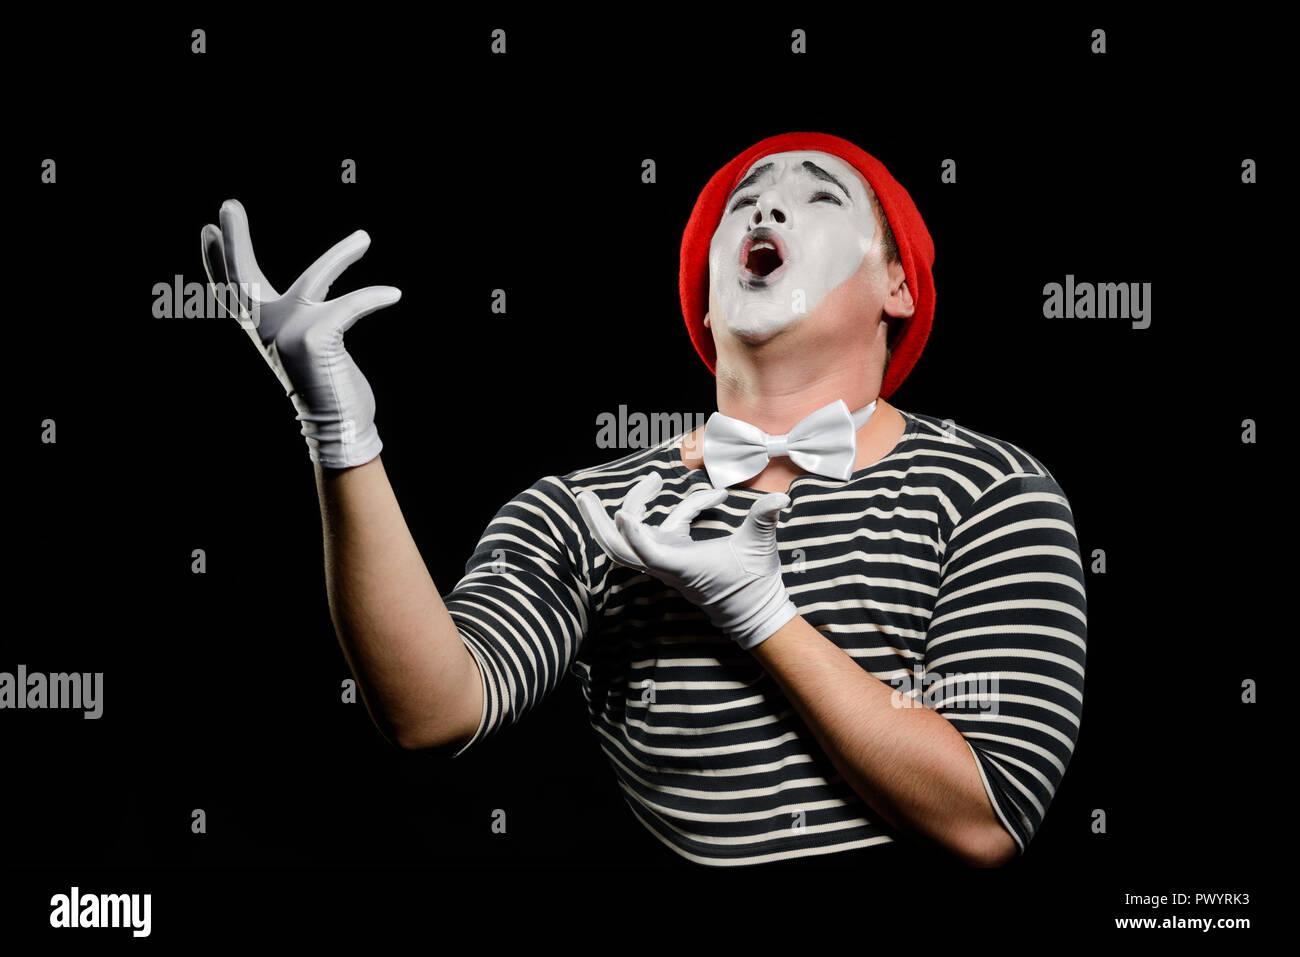 Male mime singing opera - Stock Image